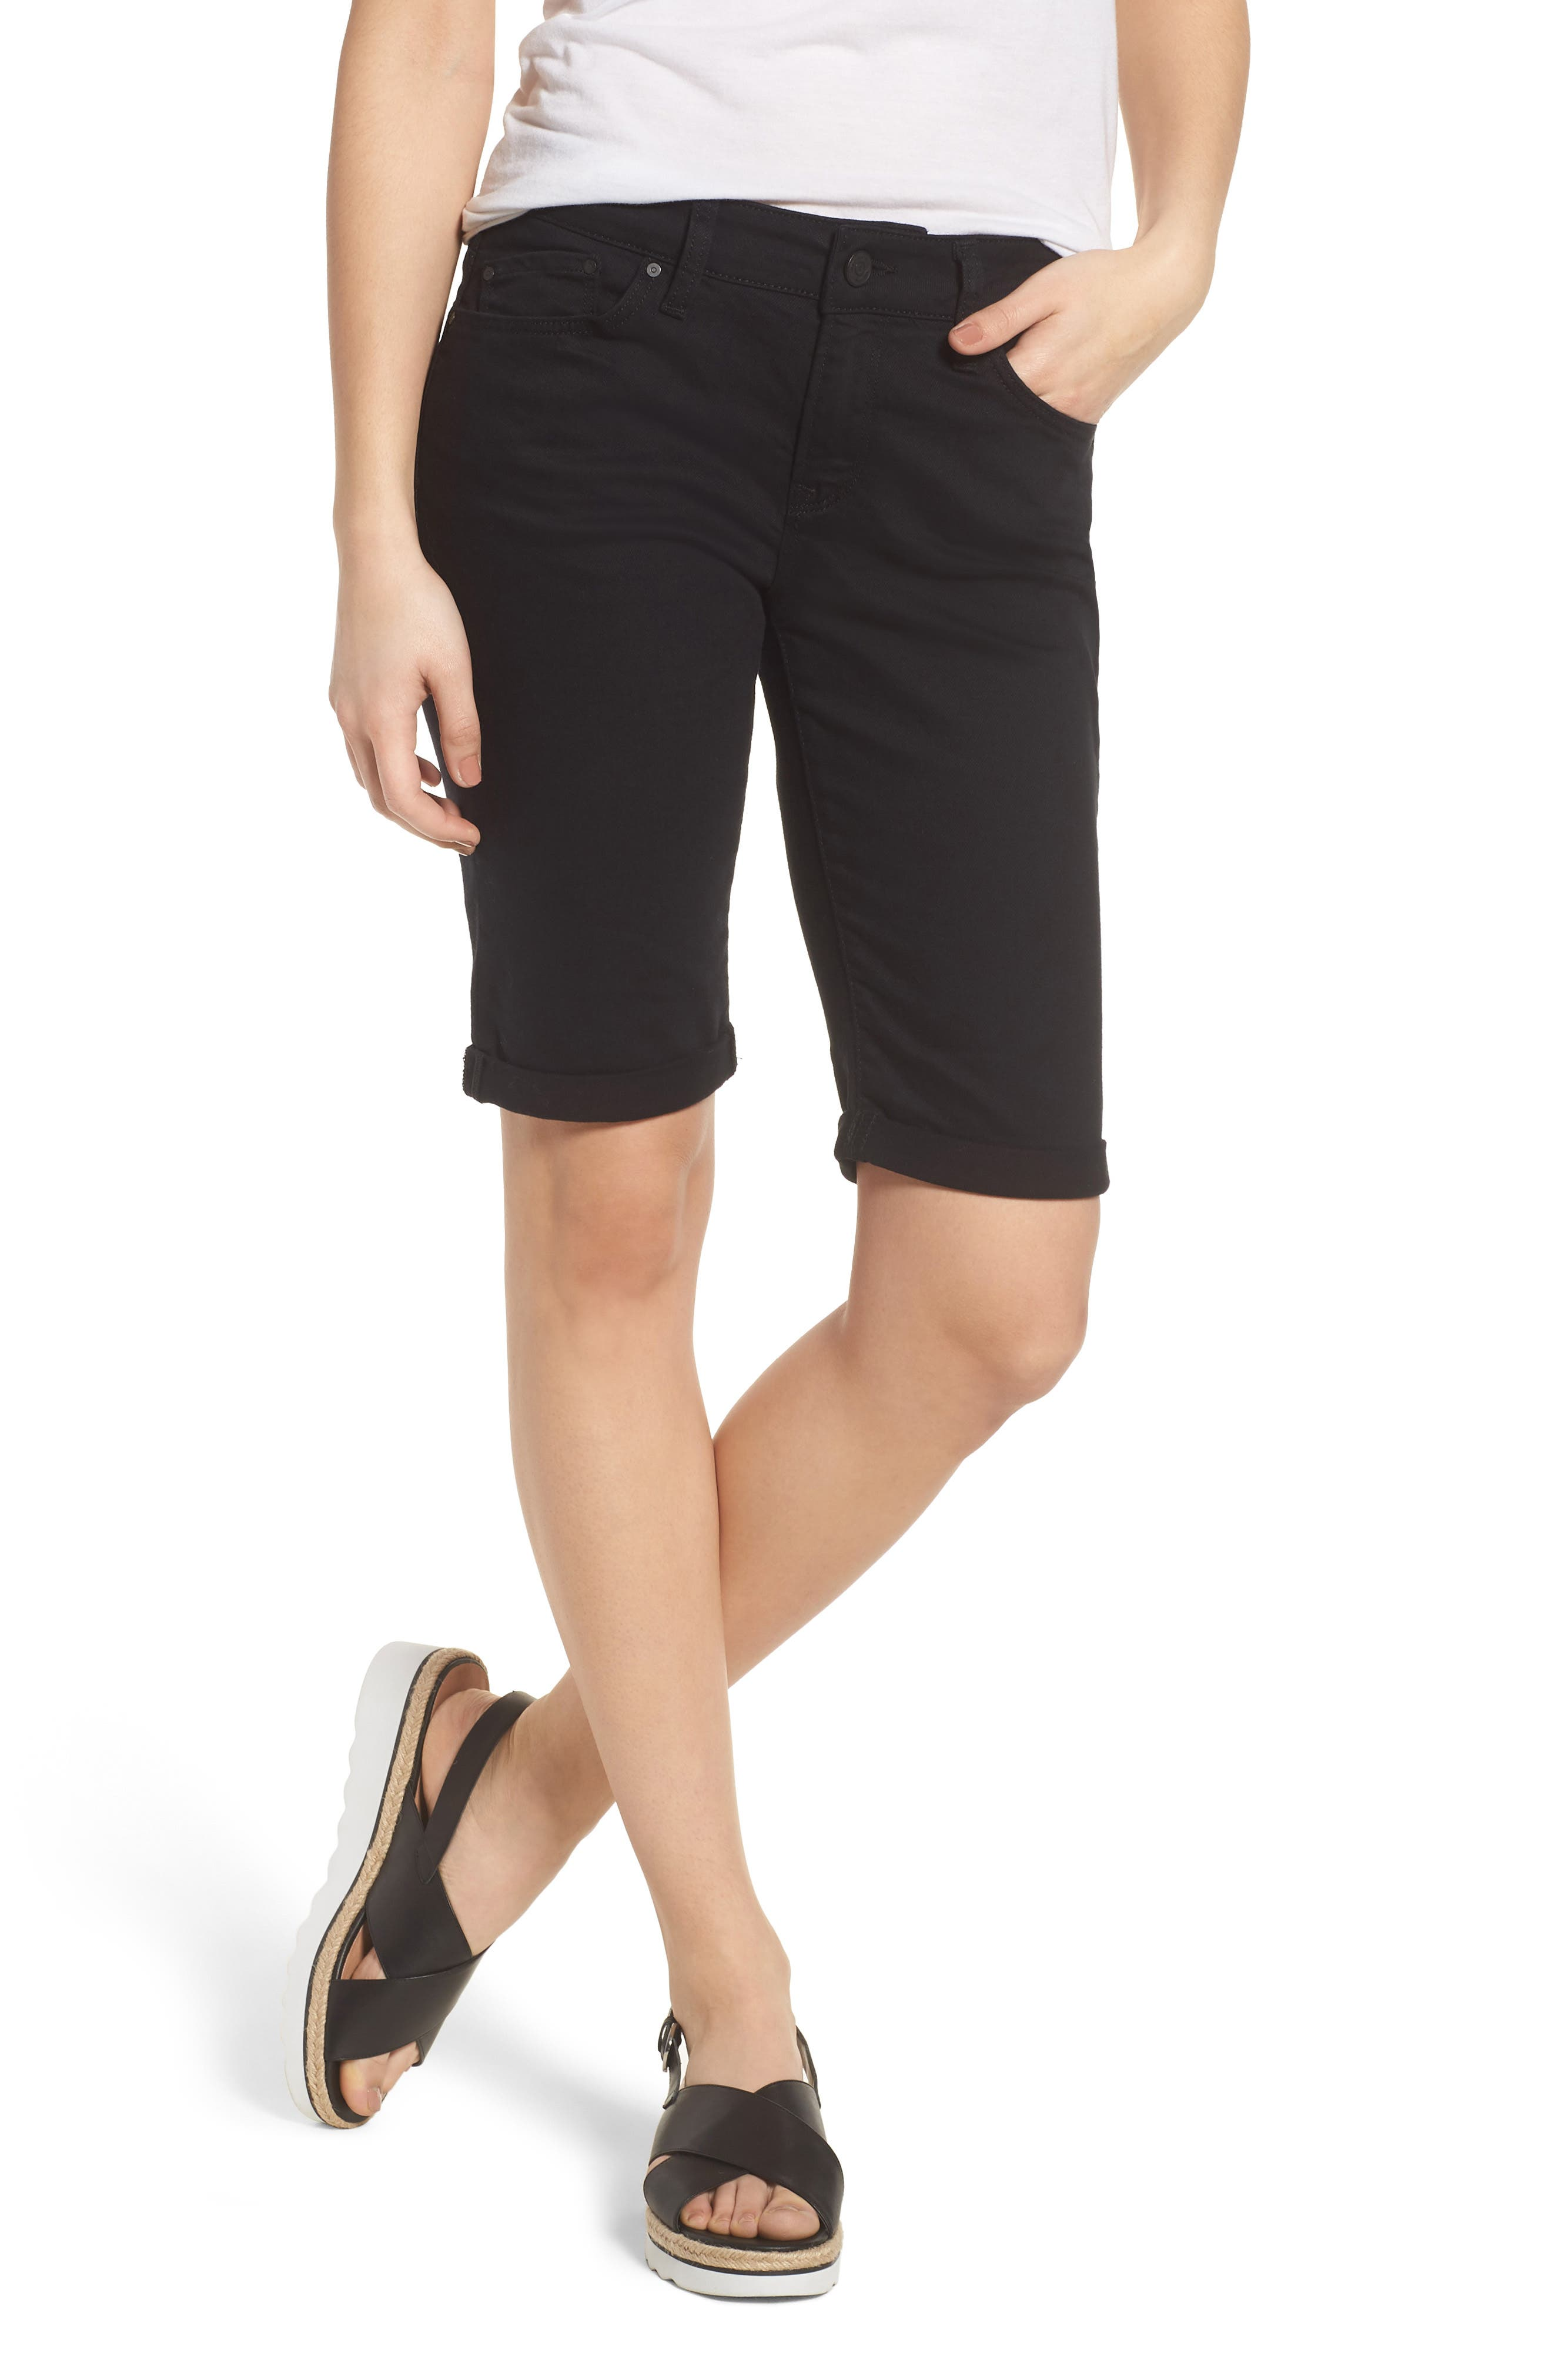 Karly Black Nolita Roll Cuff Bermuda Shorts,                         Main,                         color,